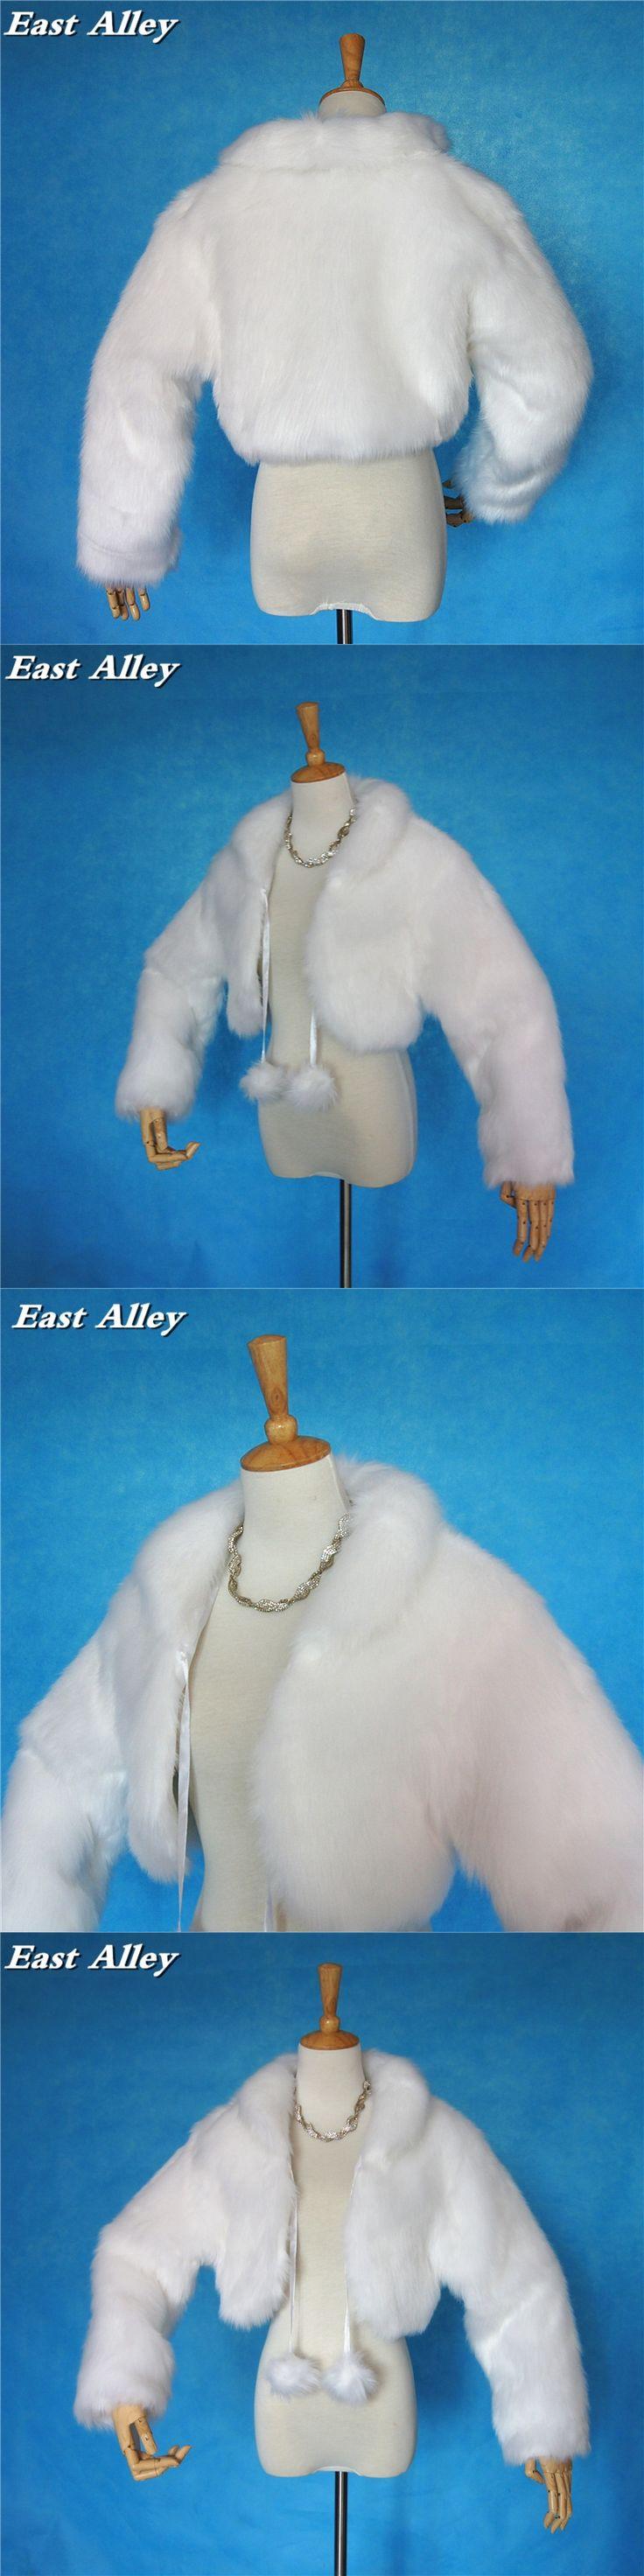 Winter Outdoor Women's Jacket Wedding Coat Long Sleeves Faux Fur Wrap Shrug Bolero Shawl in Ivory and White